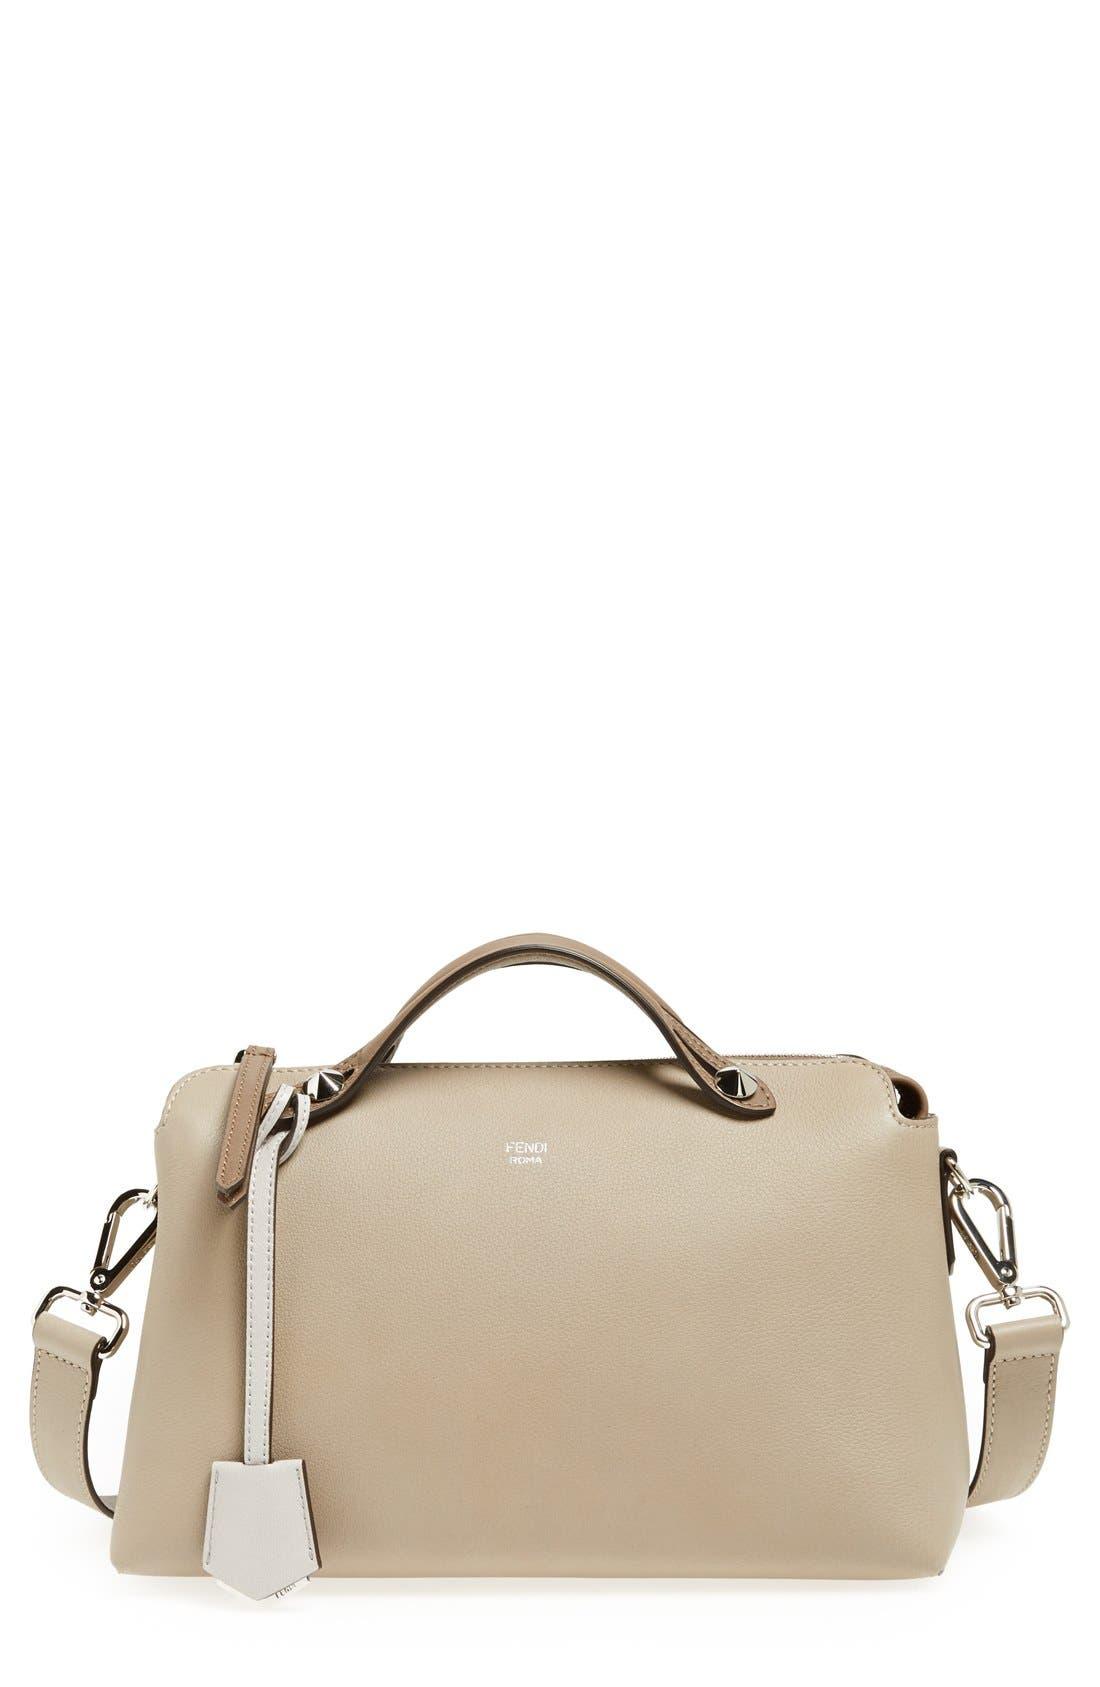 Alternate Image 1 Selected - Fendi 'Bauletto Piccolo' Leather Crossbody Bag